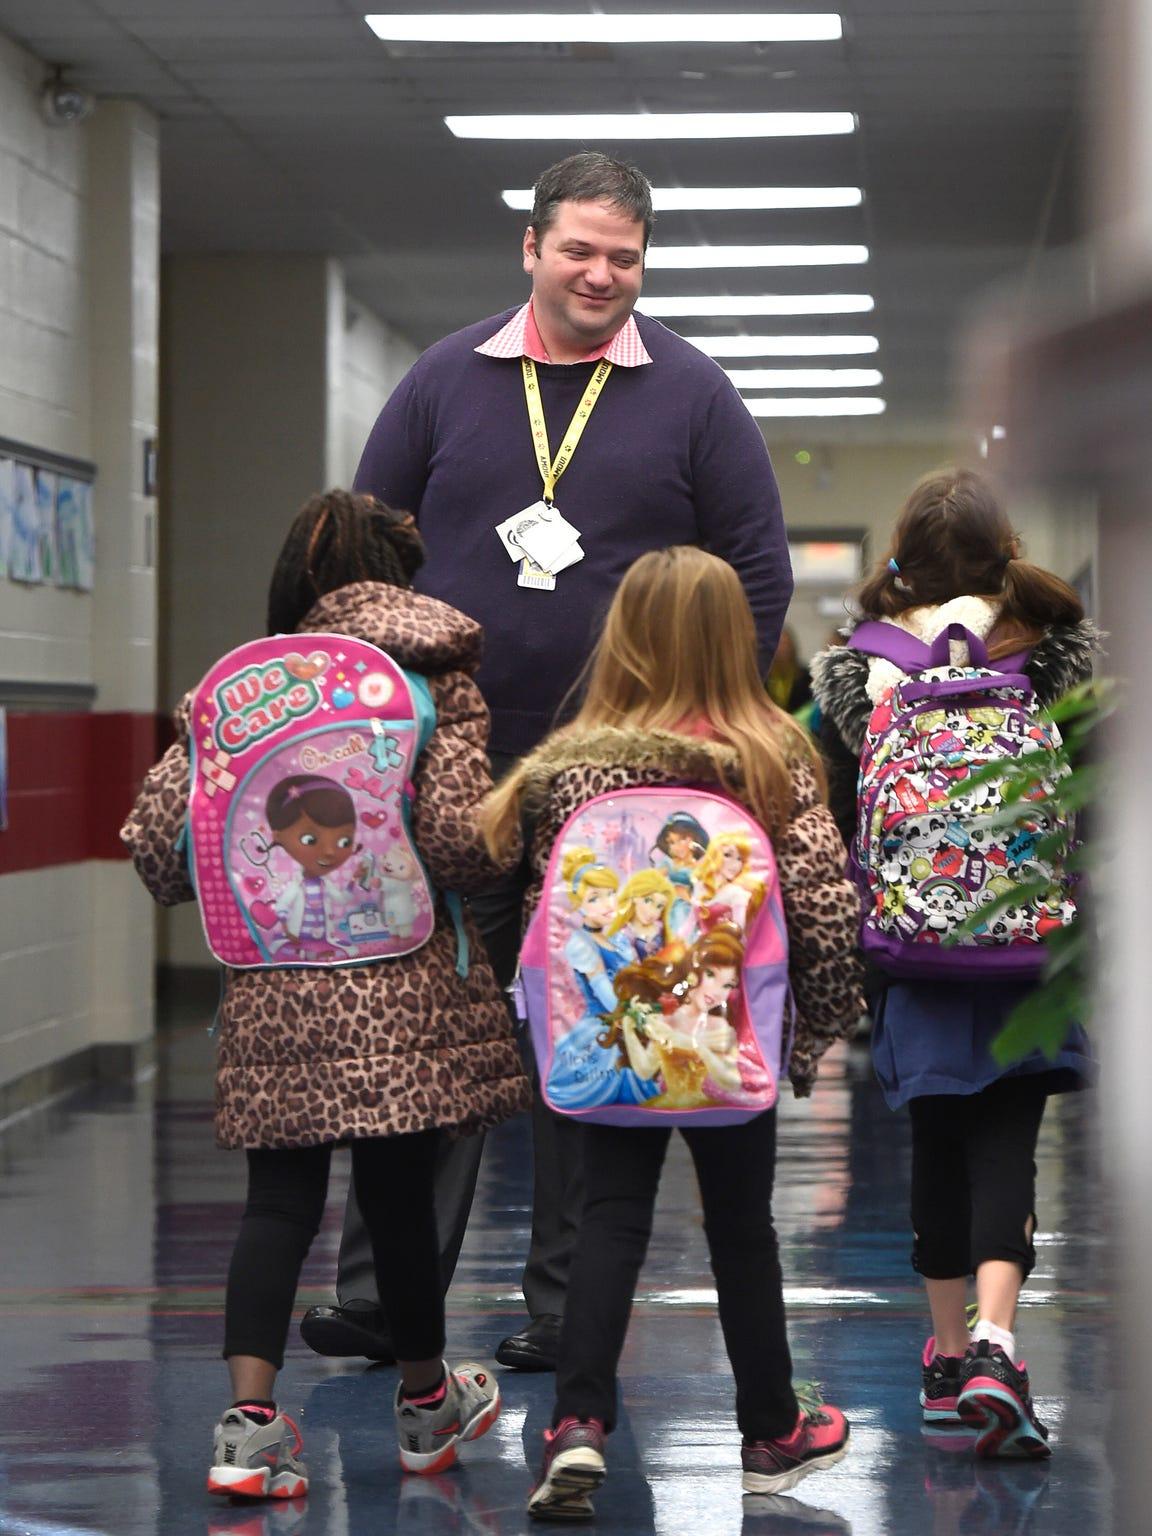 Amqui Elementary School Principal Lance High hugs a